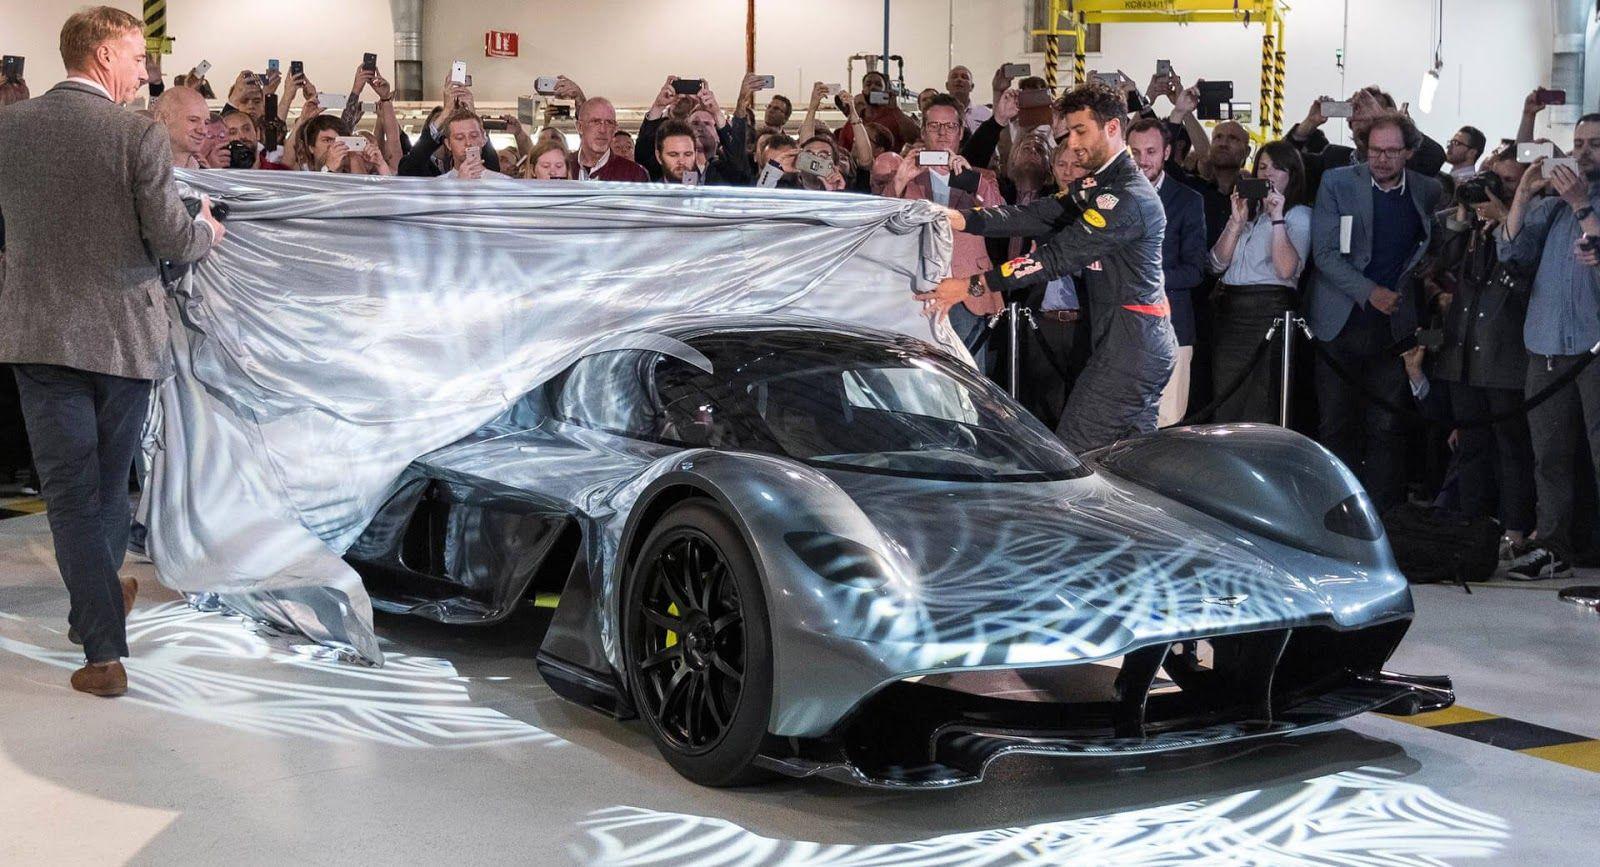 Aston Martin To Roll Out Ferrari 488 Gtb Rival In 2021 Ceo Says Carscoops Aston Martin Aston Martin Cars Aston Martin Sports Car